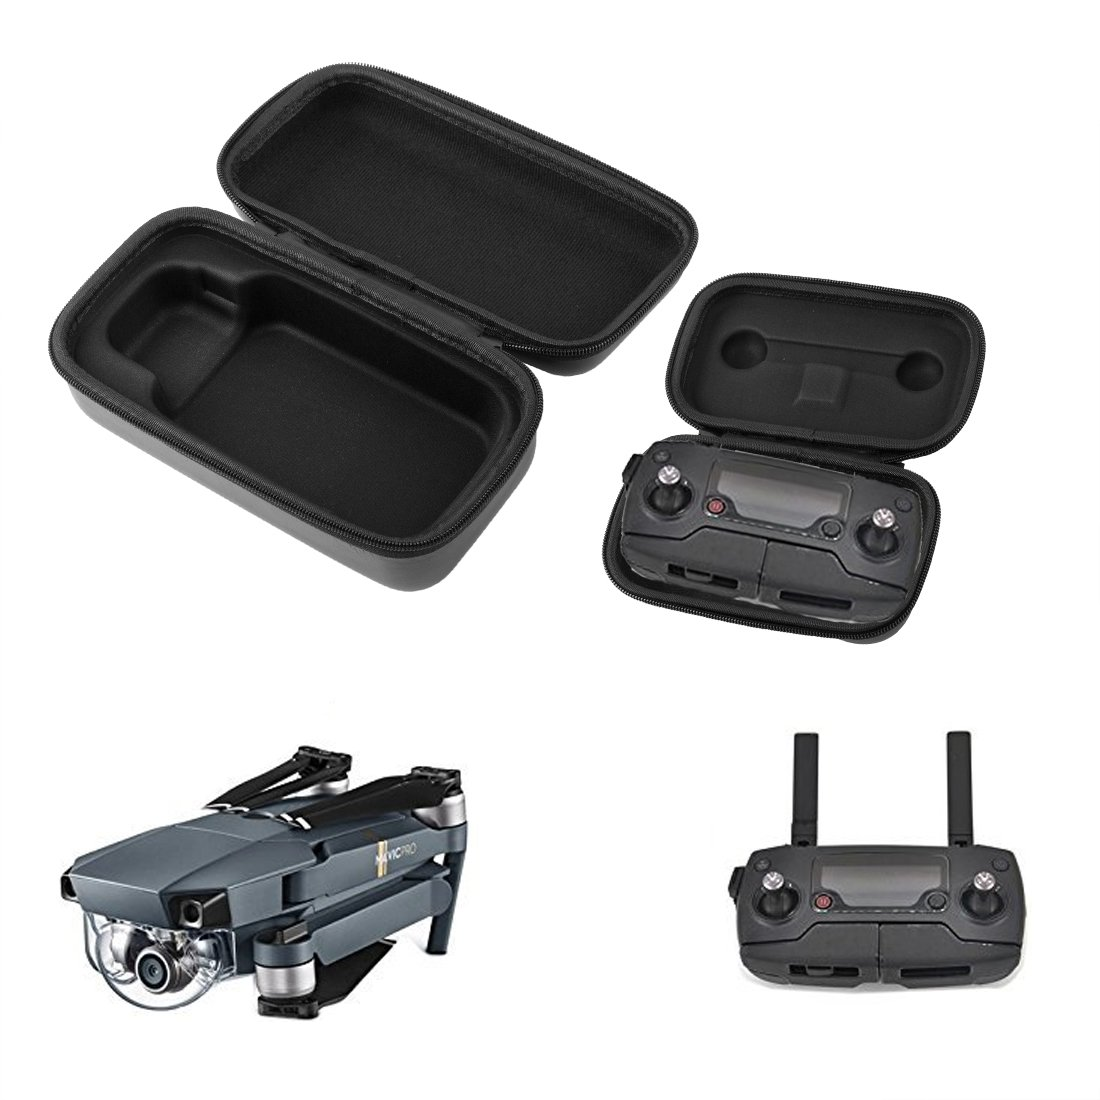 Desel DJI Mavic Pro/Platinum Case PU Leather Mavic Pro Carrying Case Waterproof Shockproof Portable Foldable Storage Bag Travel Case for DJI Mavic Pro Drone Body Remote Controller Transmitter